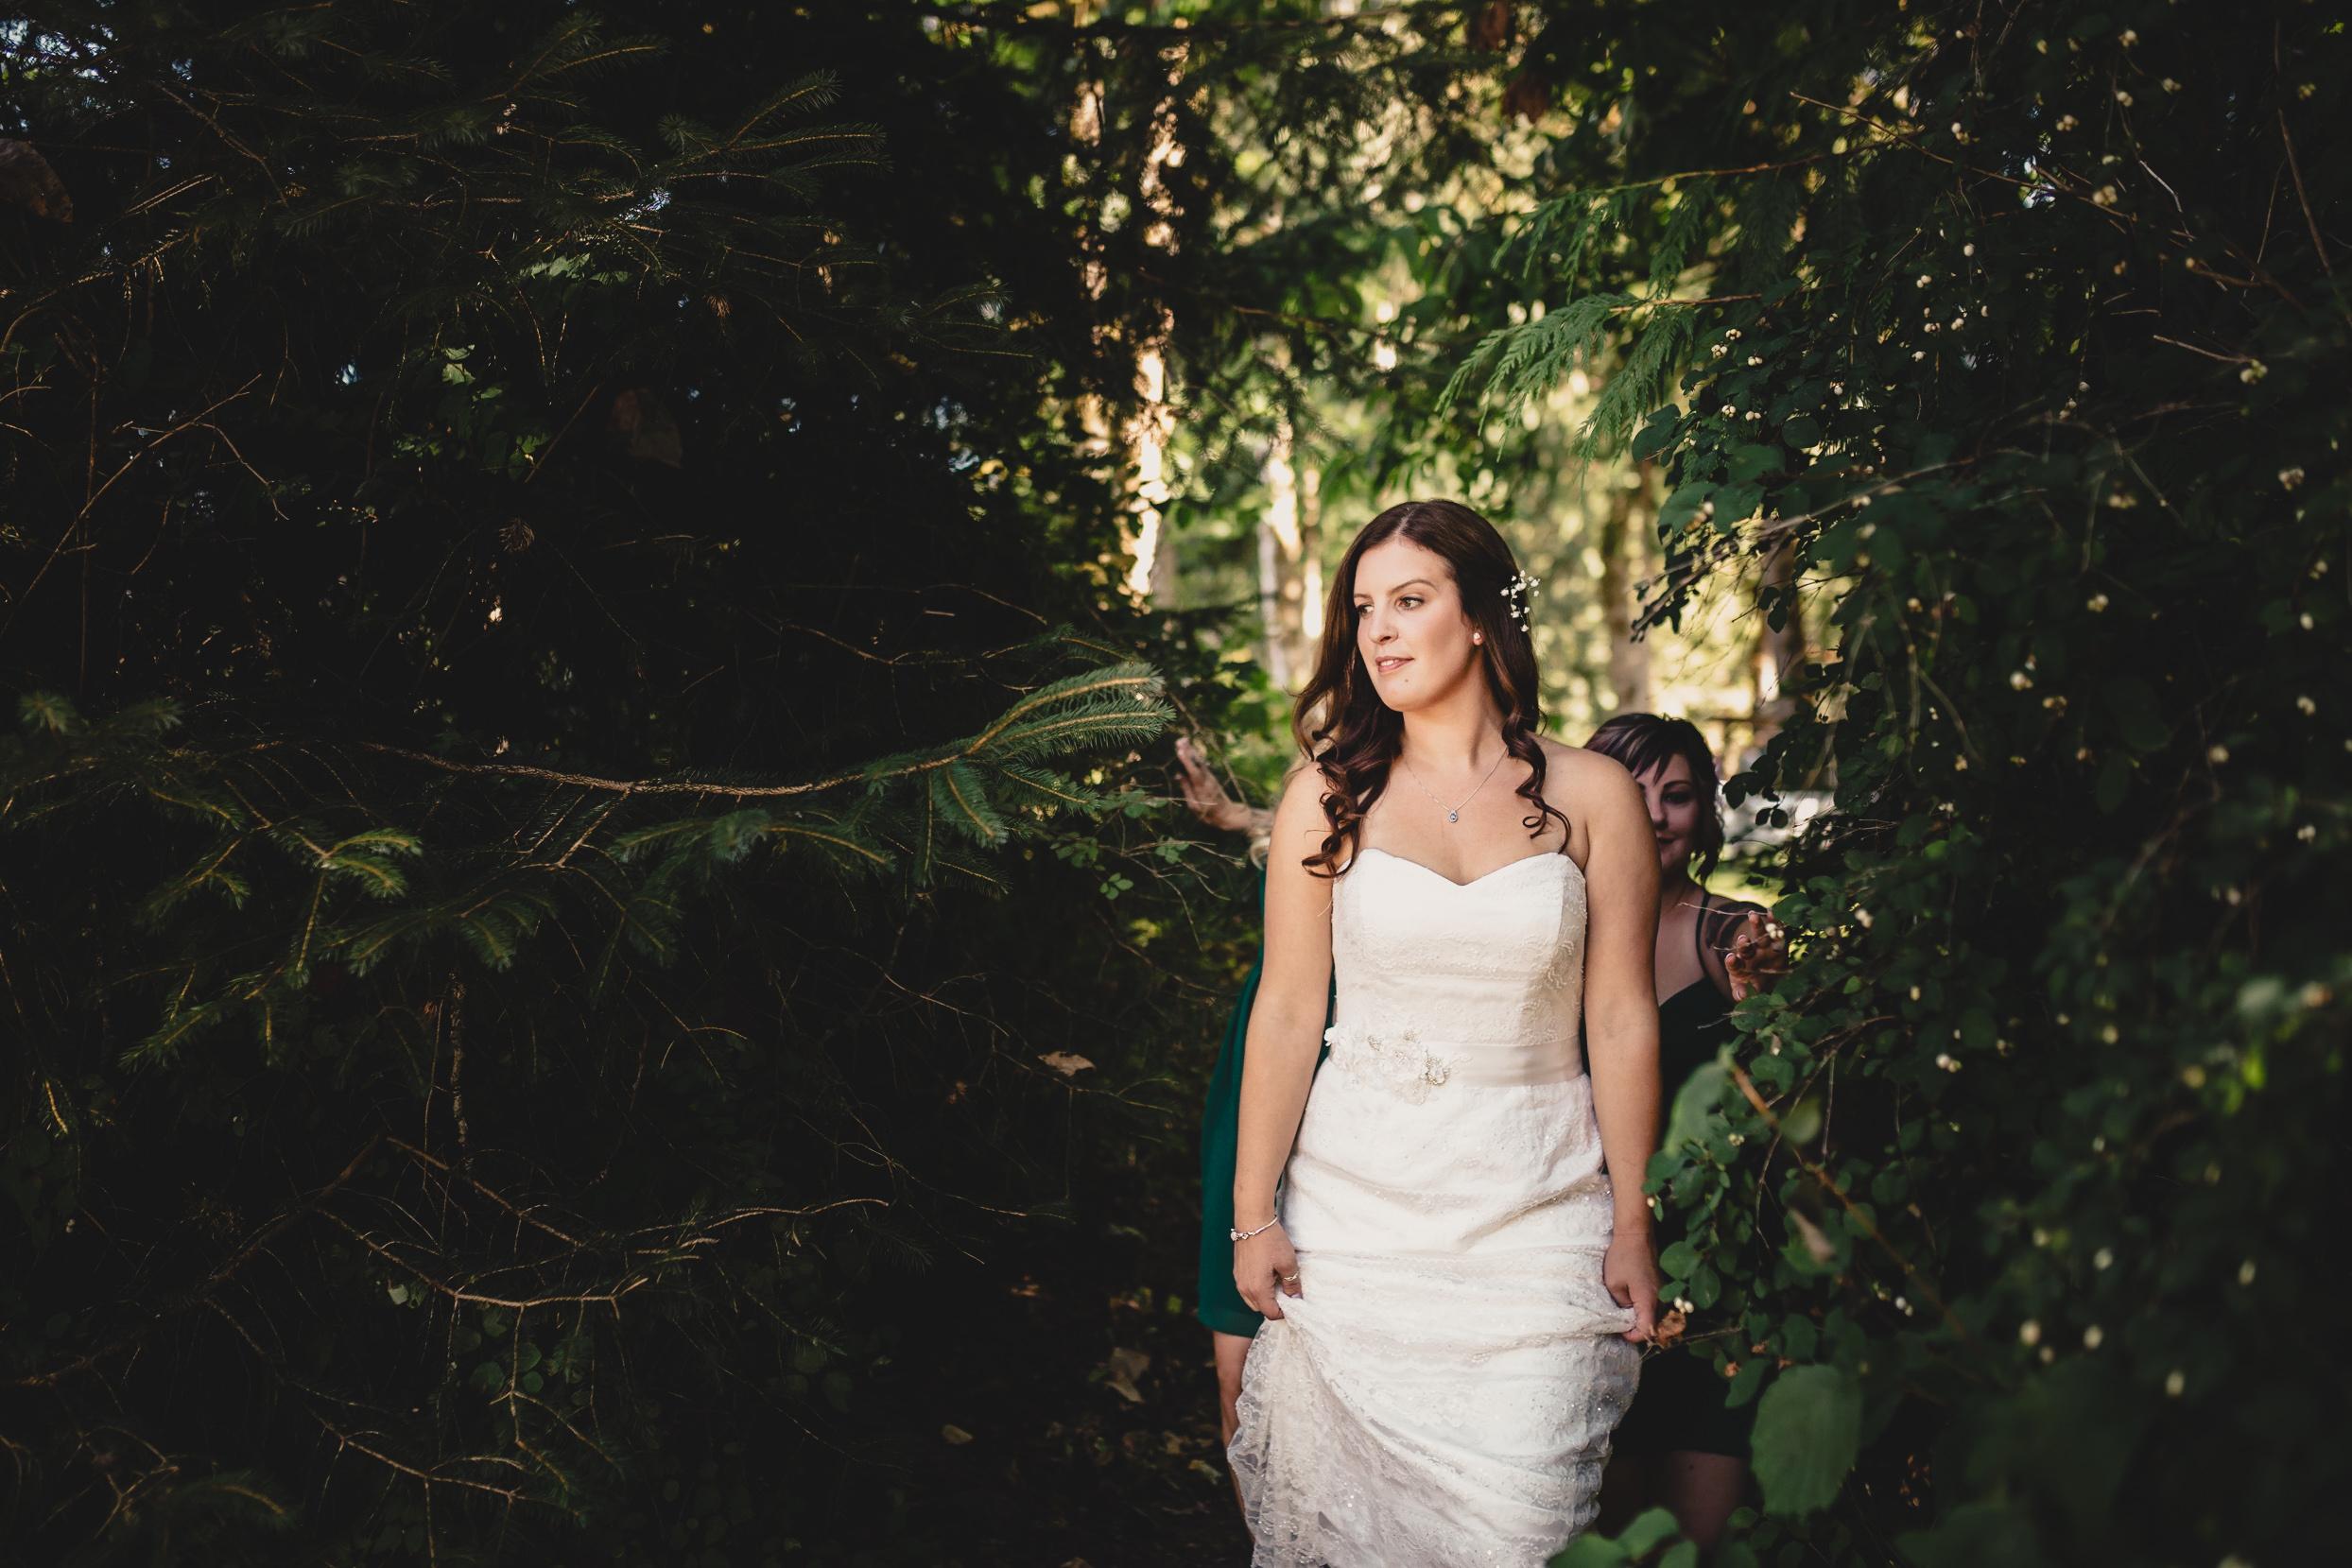 PORTFOLIO - WEDDINGS AND ENGAGEMENTS